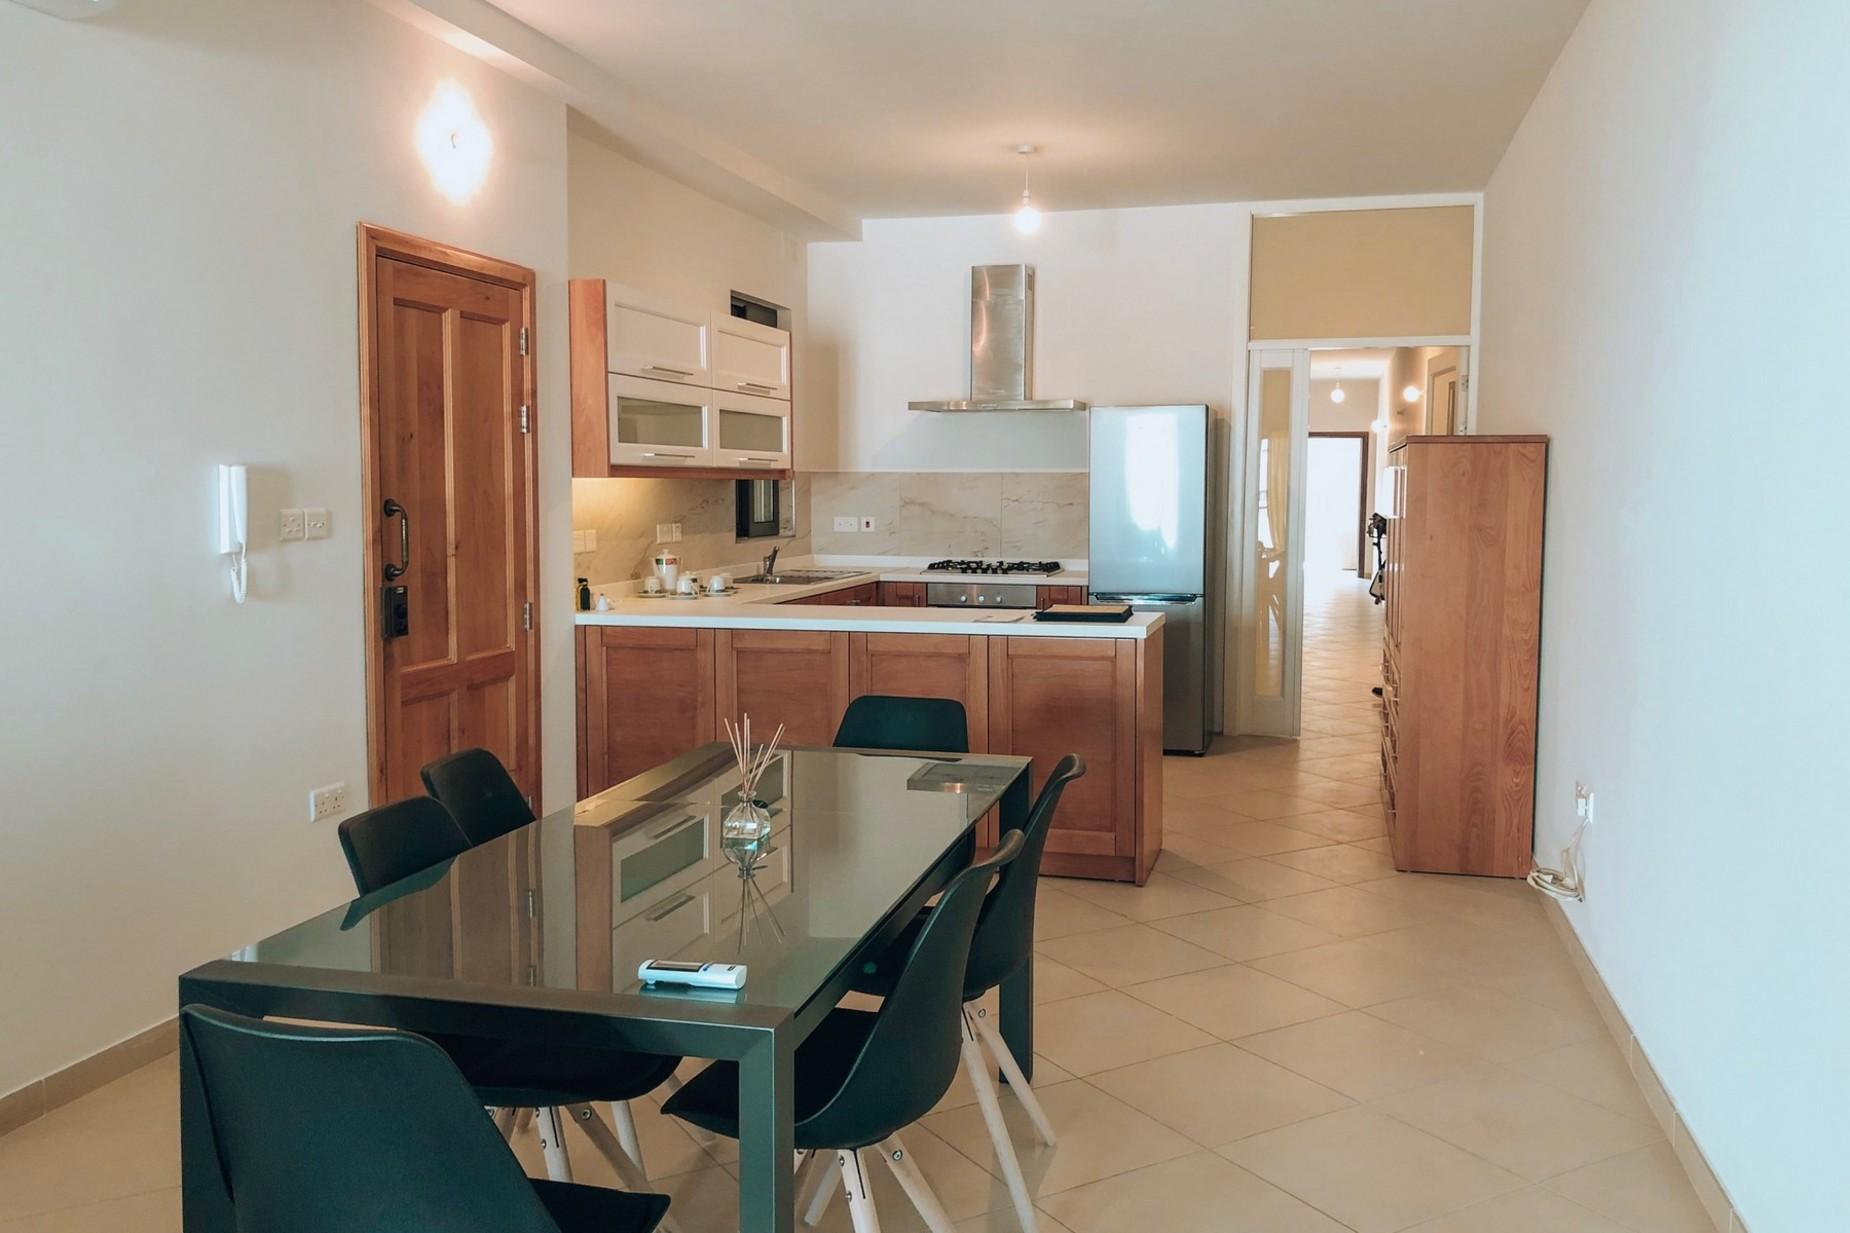 3 bed Apartment For Rent in Balzan, Balzan - thumb 2